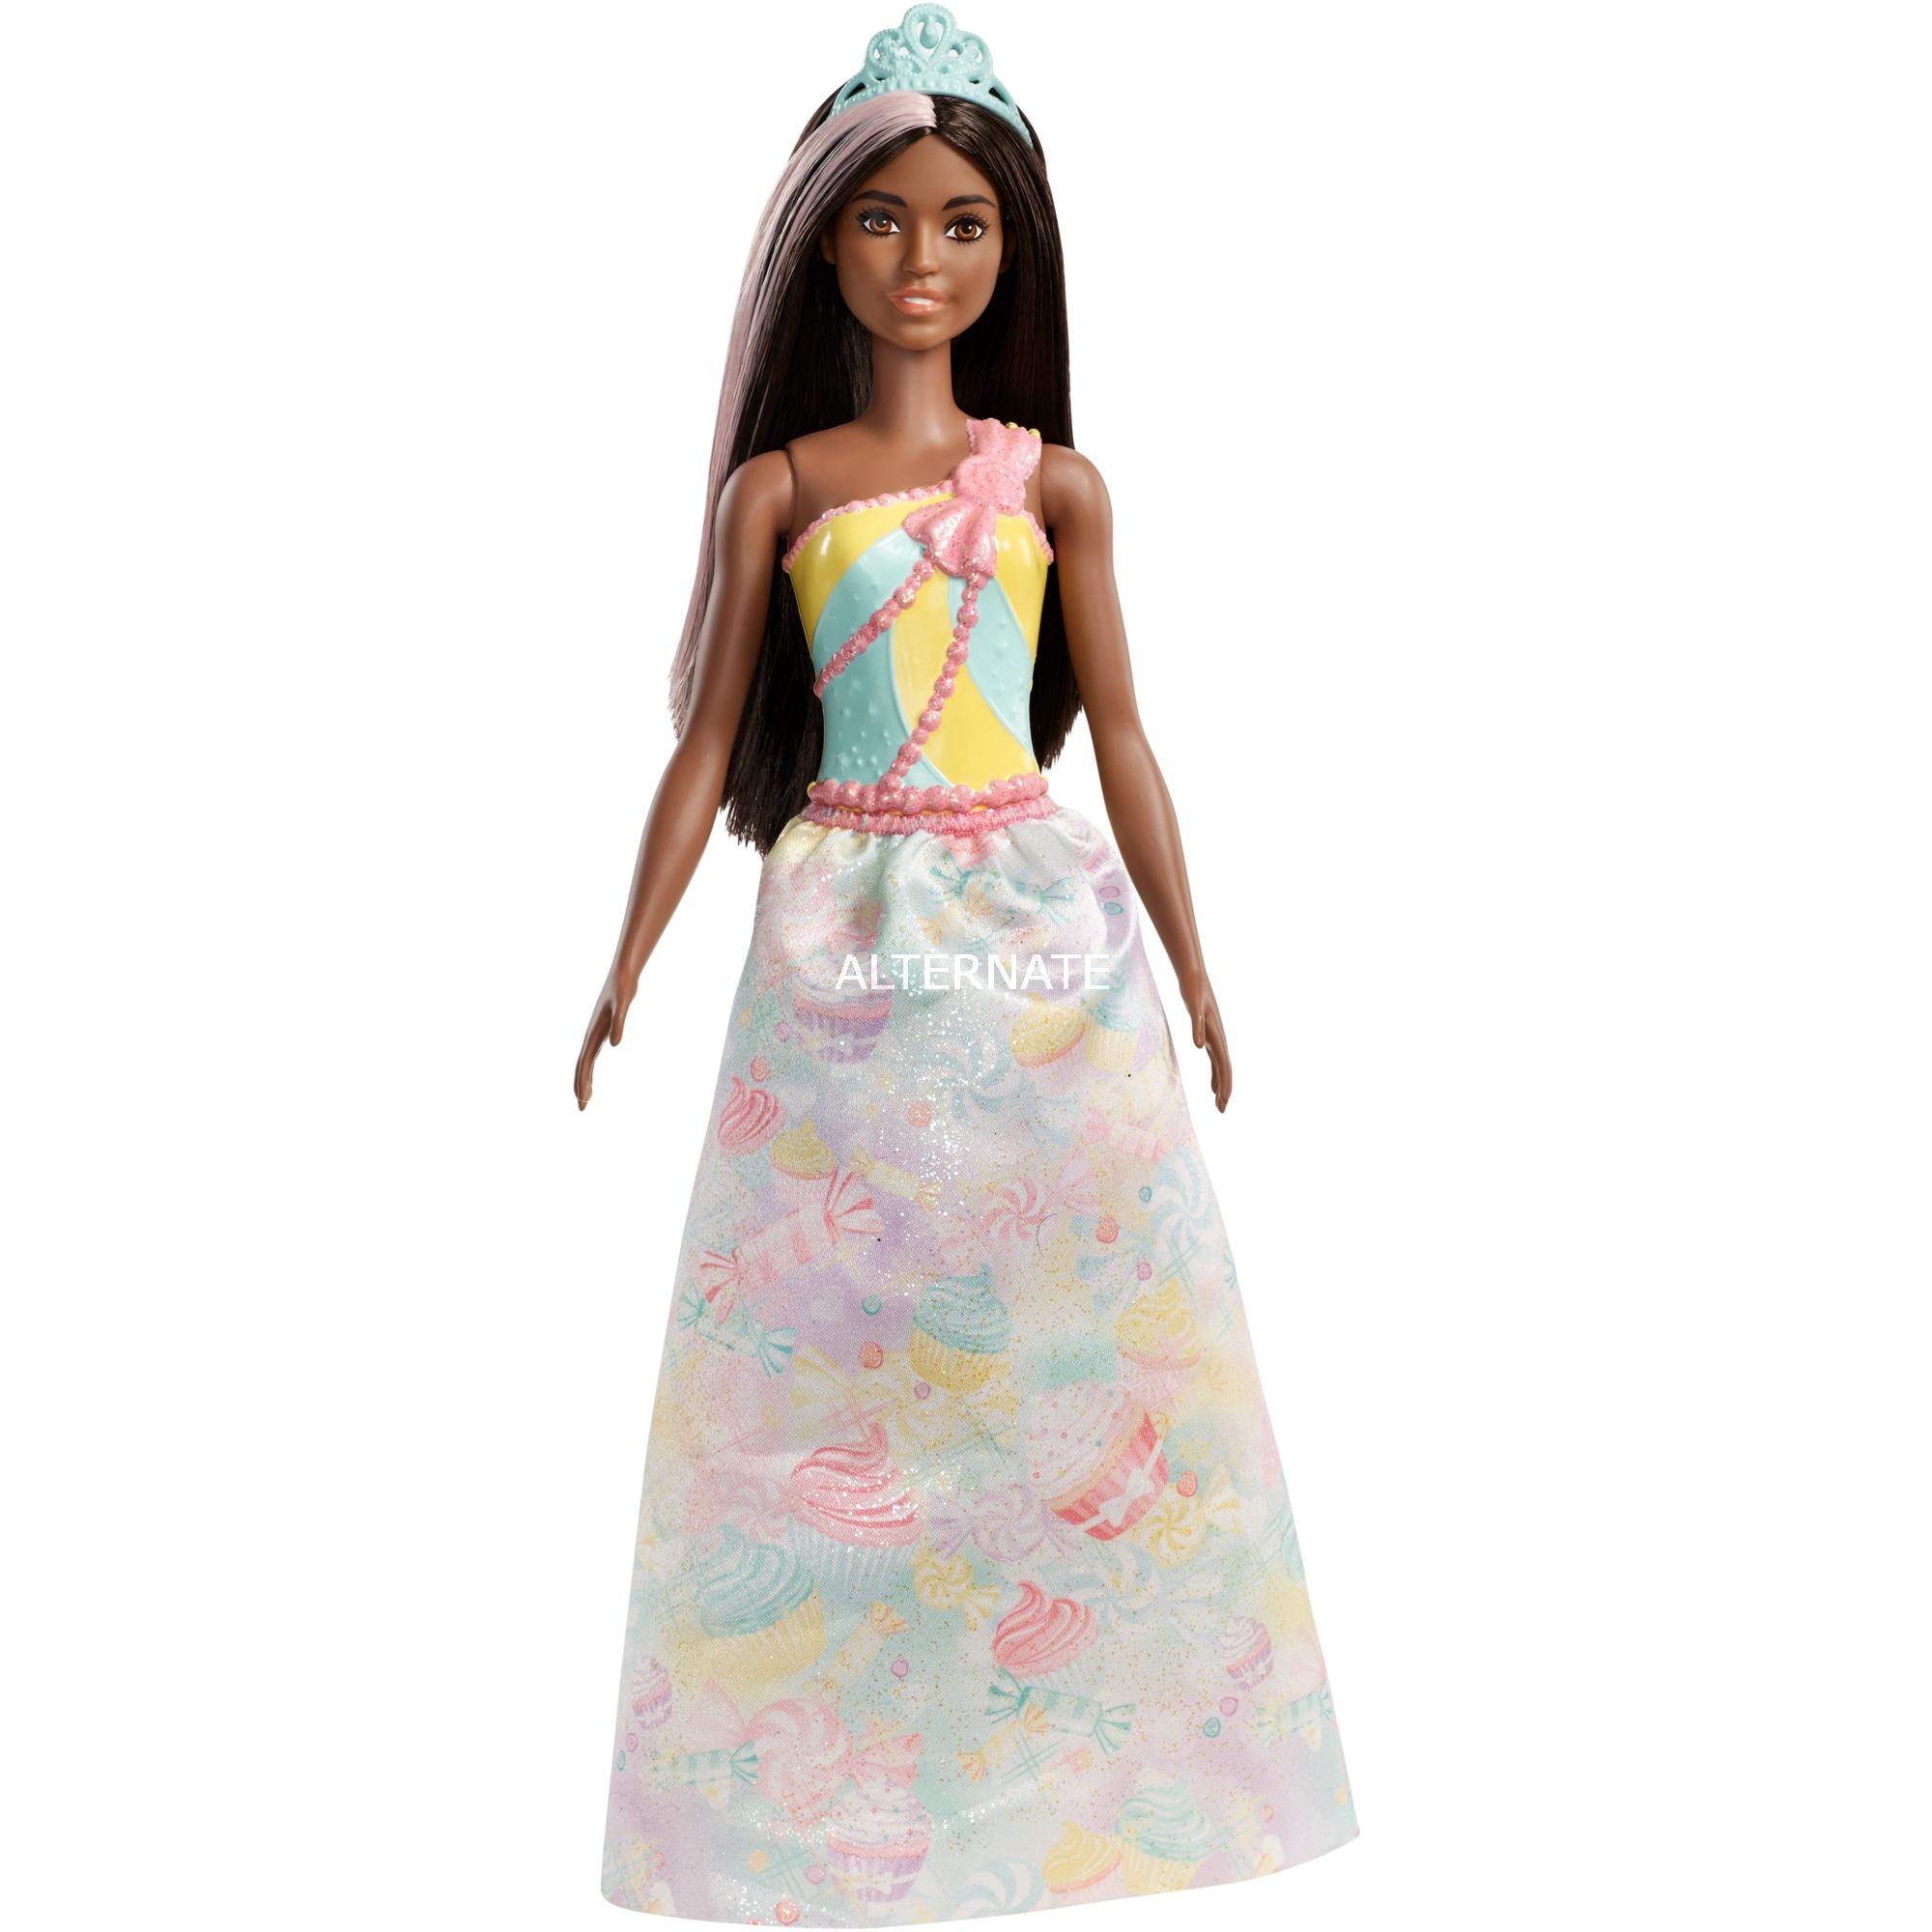 Barbie - Muñeca Pelo Castaño Oscuro - Princesa Dreamtopia